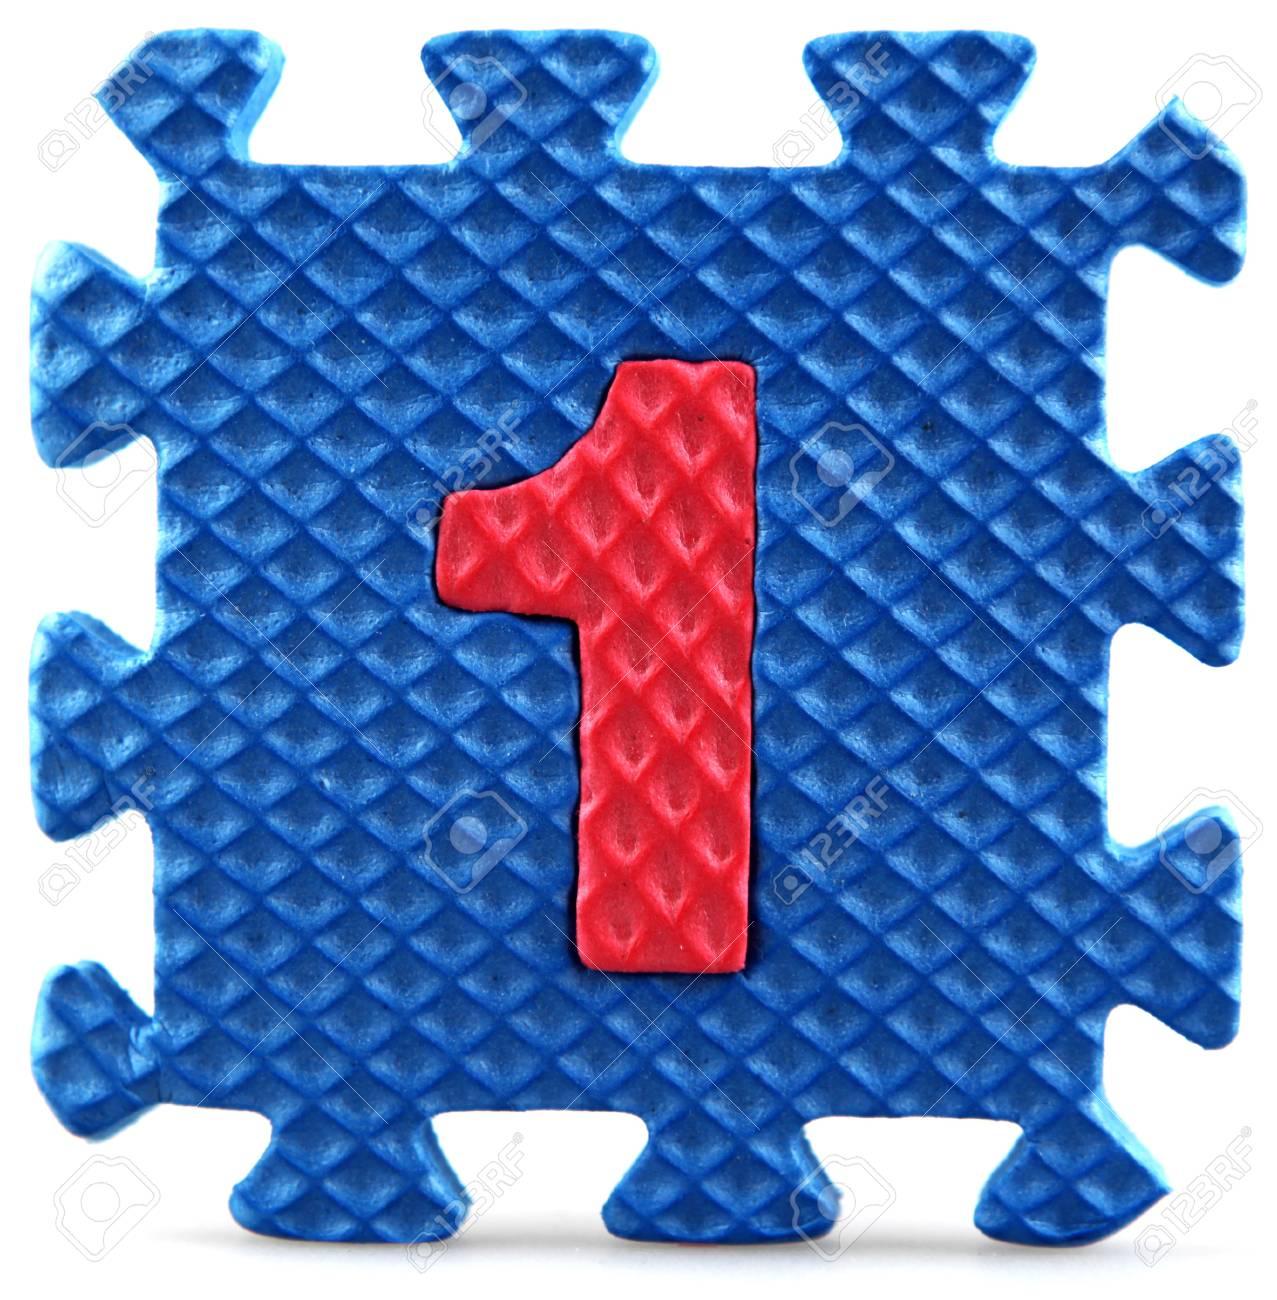 Alphabet puzzle pieces on white background Stock Photo - 9758919